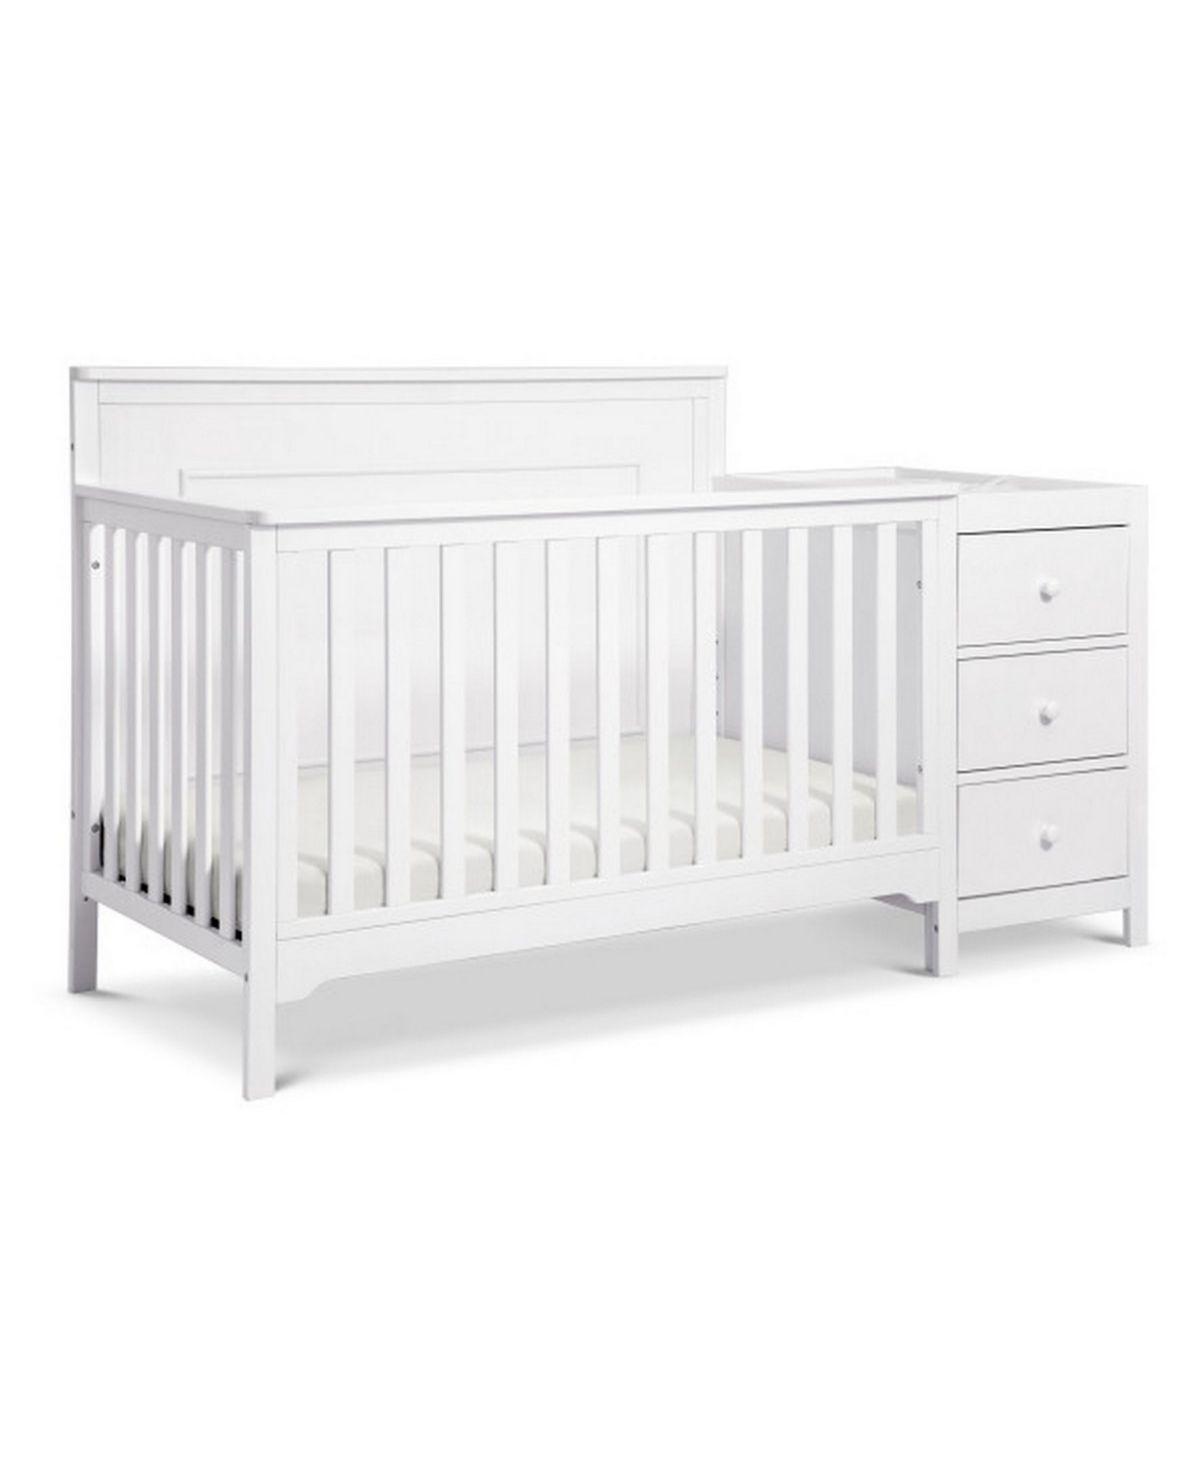 Davinci Kalani 4 In 1 Convertible Crib With Toddler Rail Review